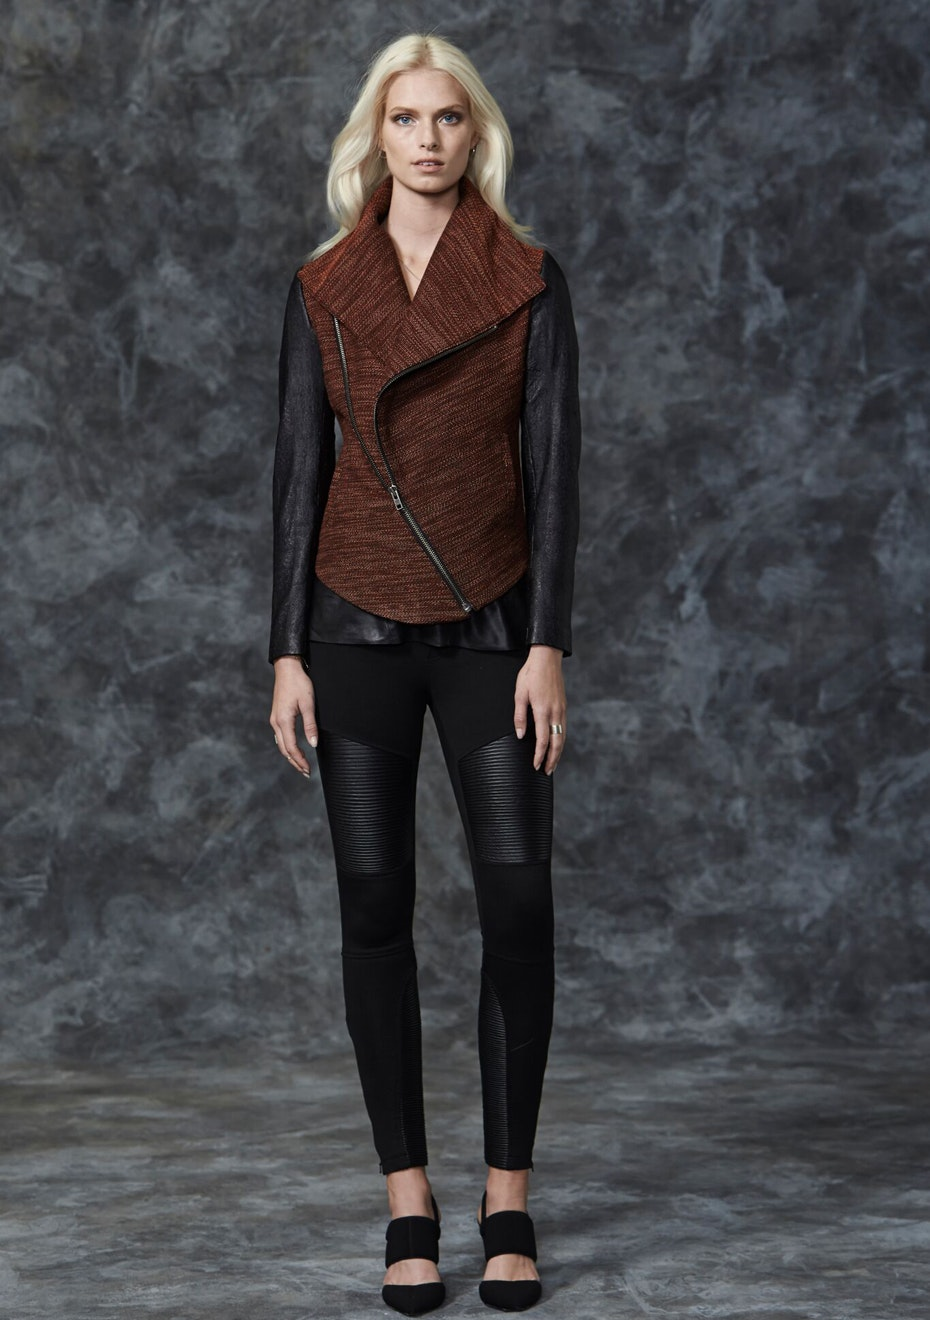 West 14th - Nolita Drape Jacket - Mix Material  - Andean Orange & Black Leather